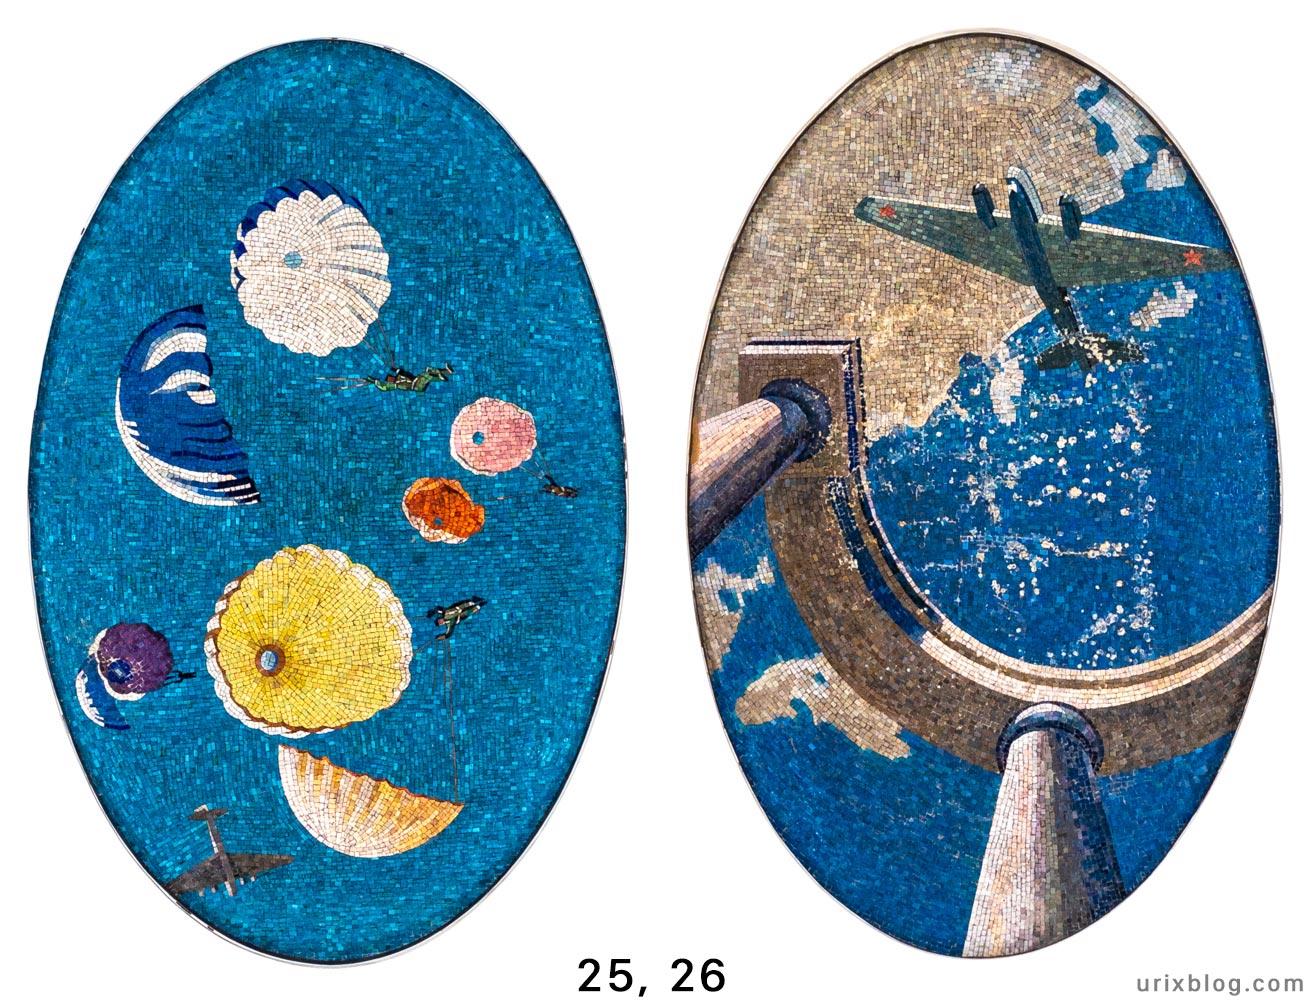 Маяковская, станция метро, мозаика, Москва, Россия, 2019, фото, фотография, СССР